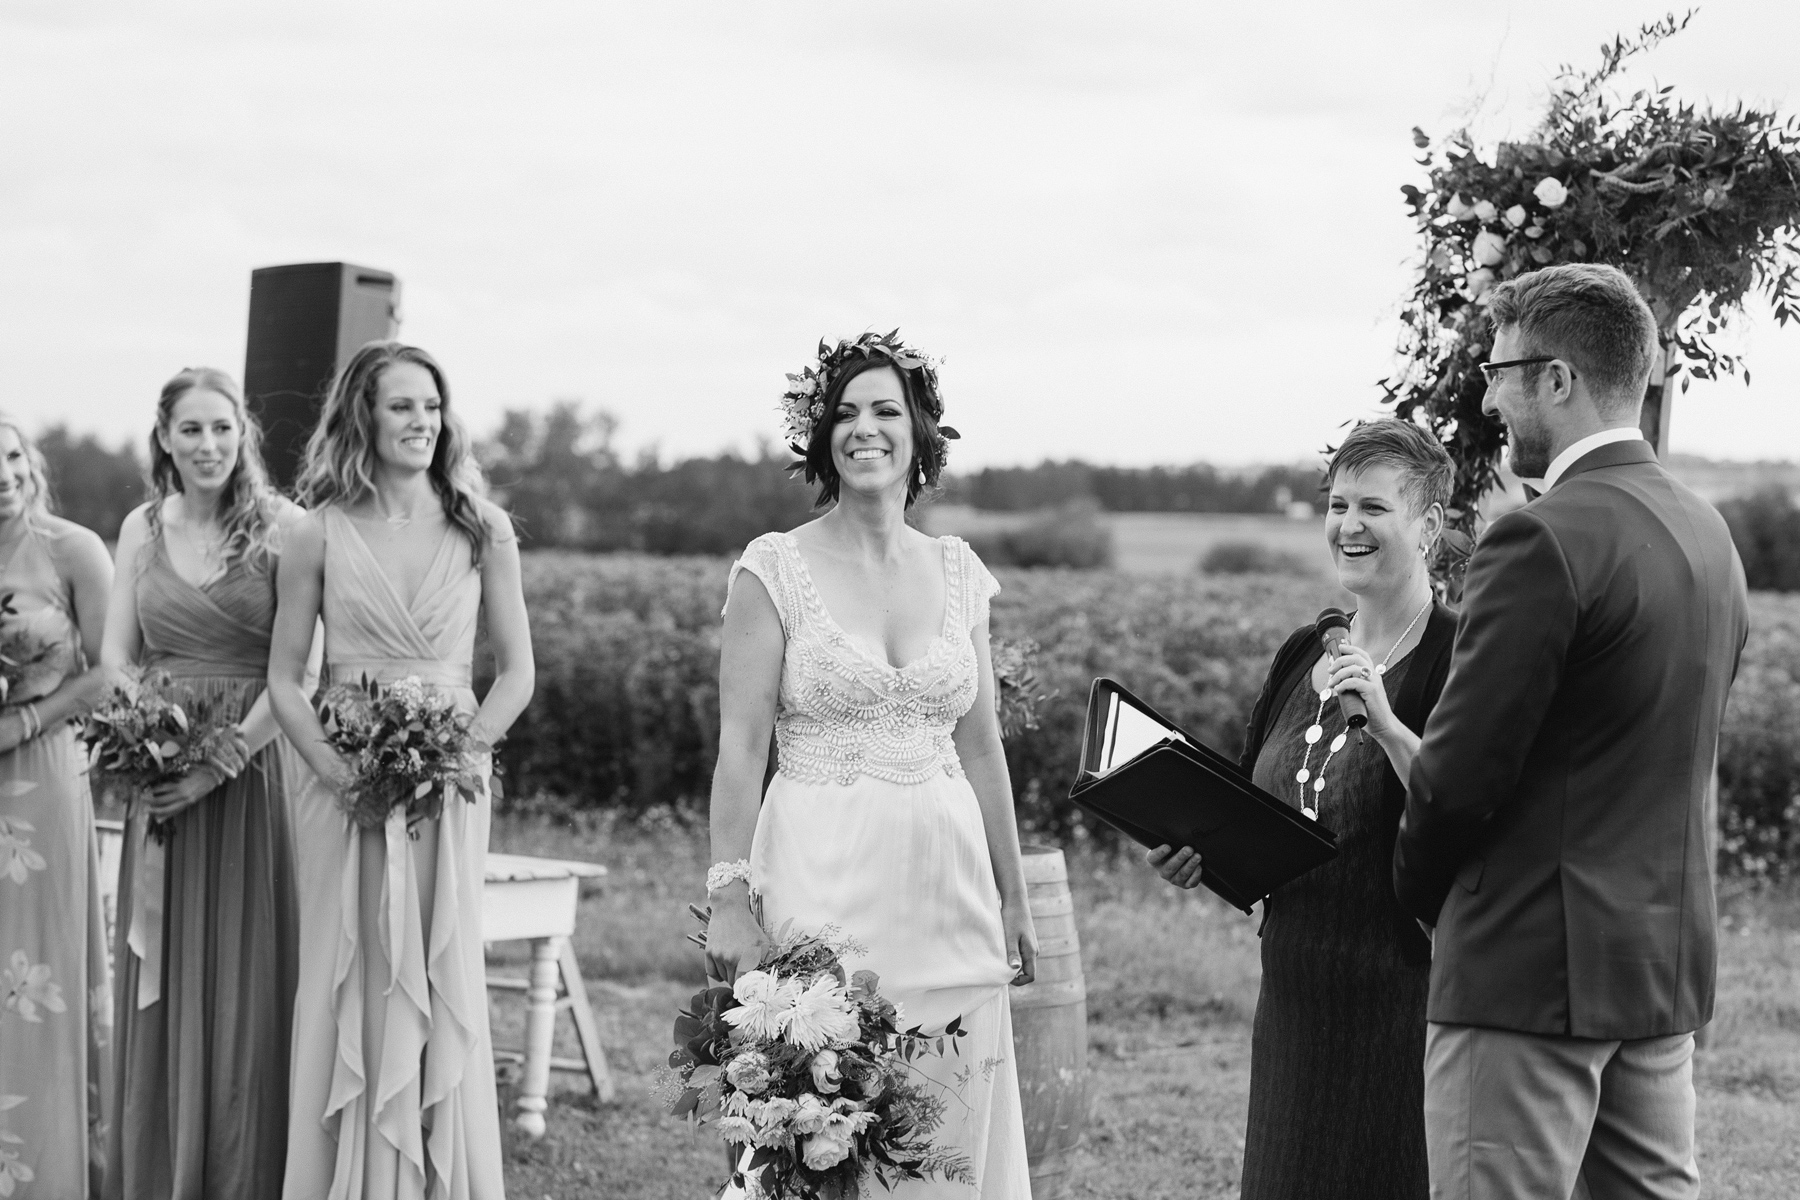 alberta-farm-wedding-photographer-rp-wj-102.jpg